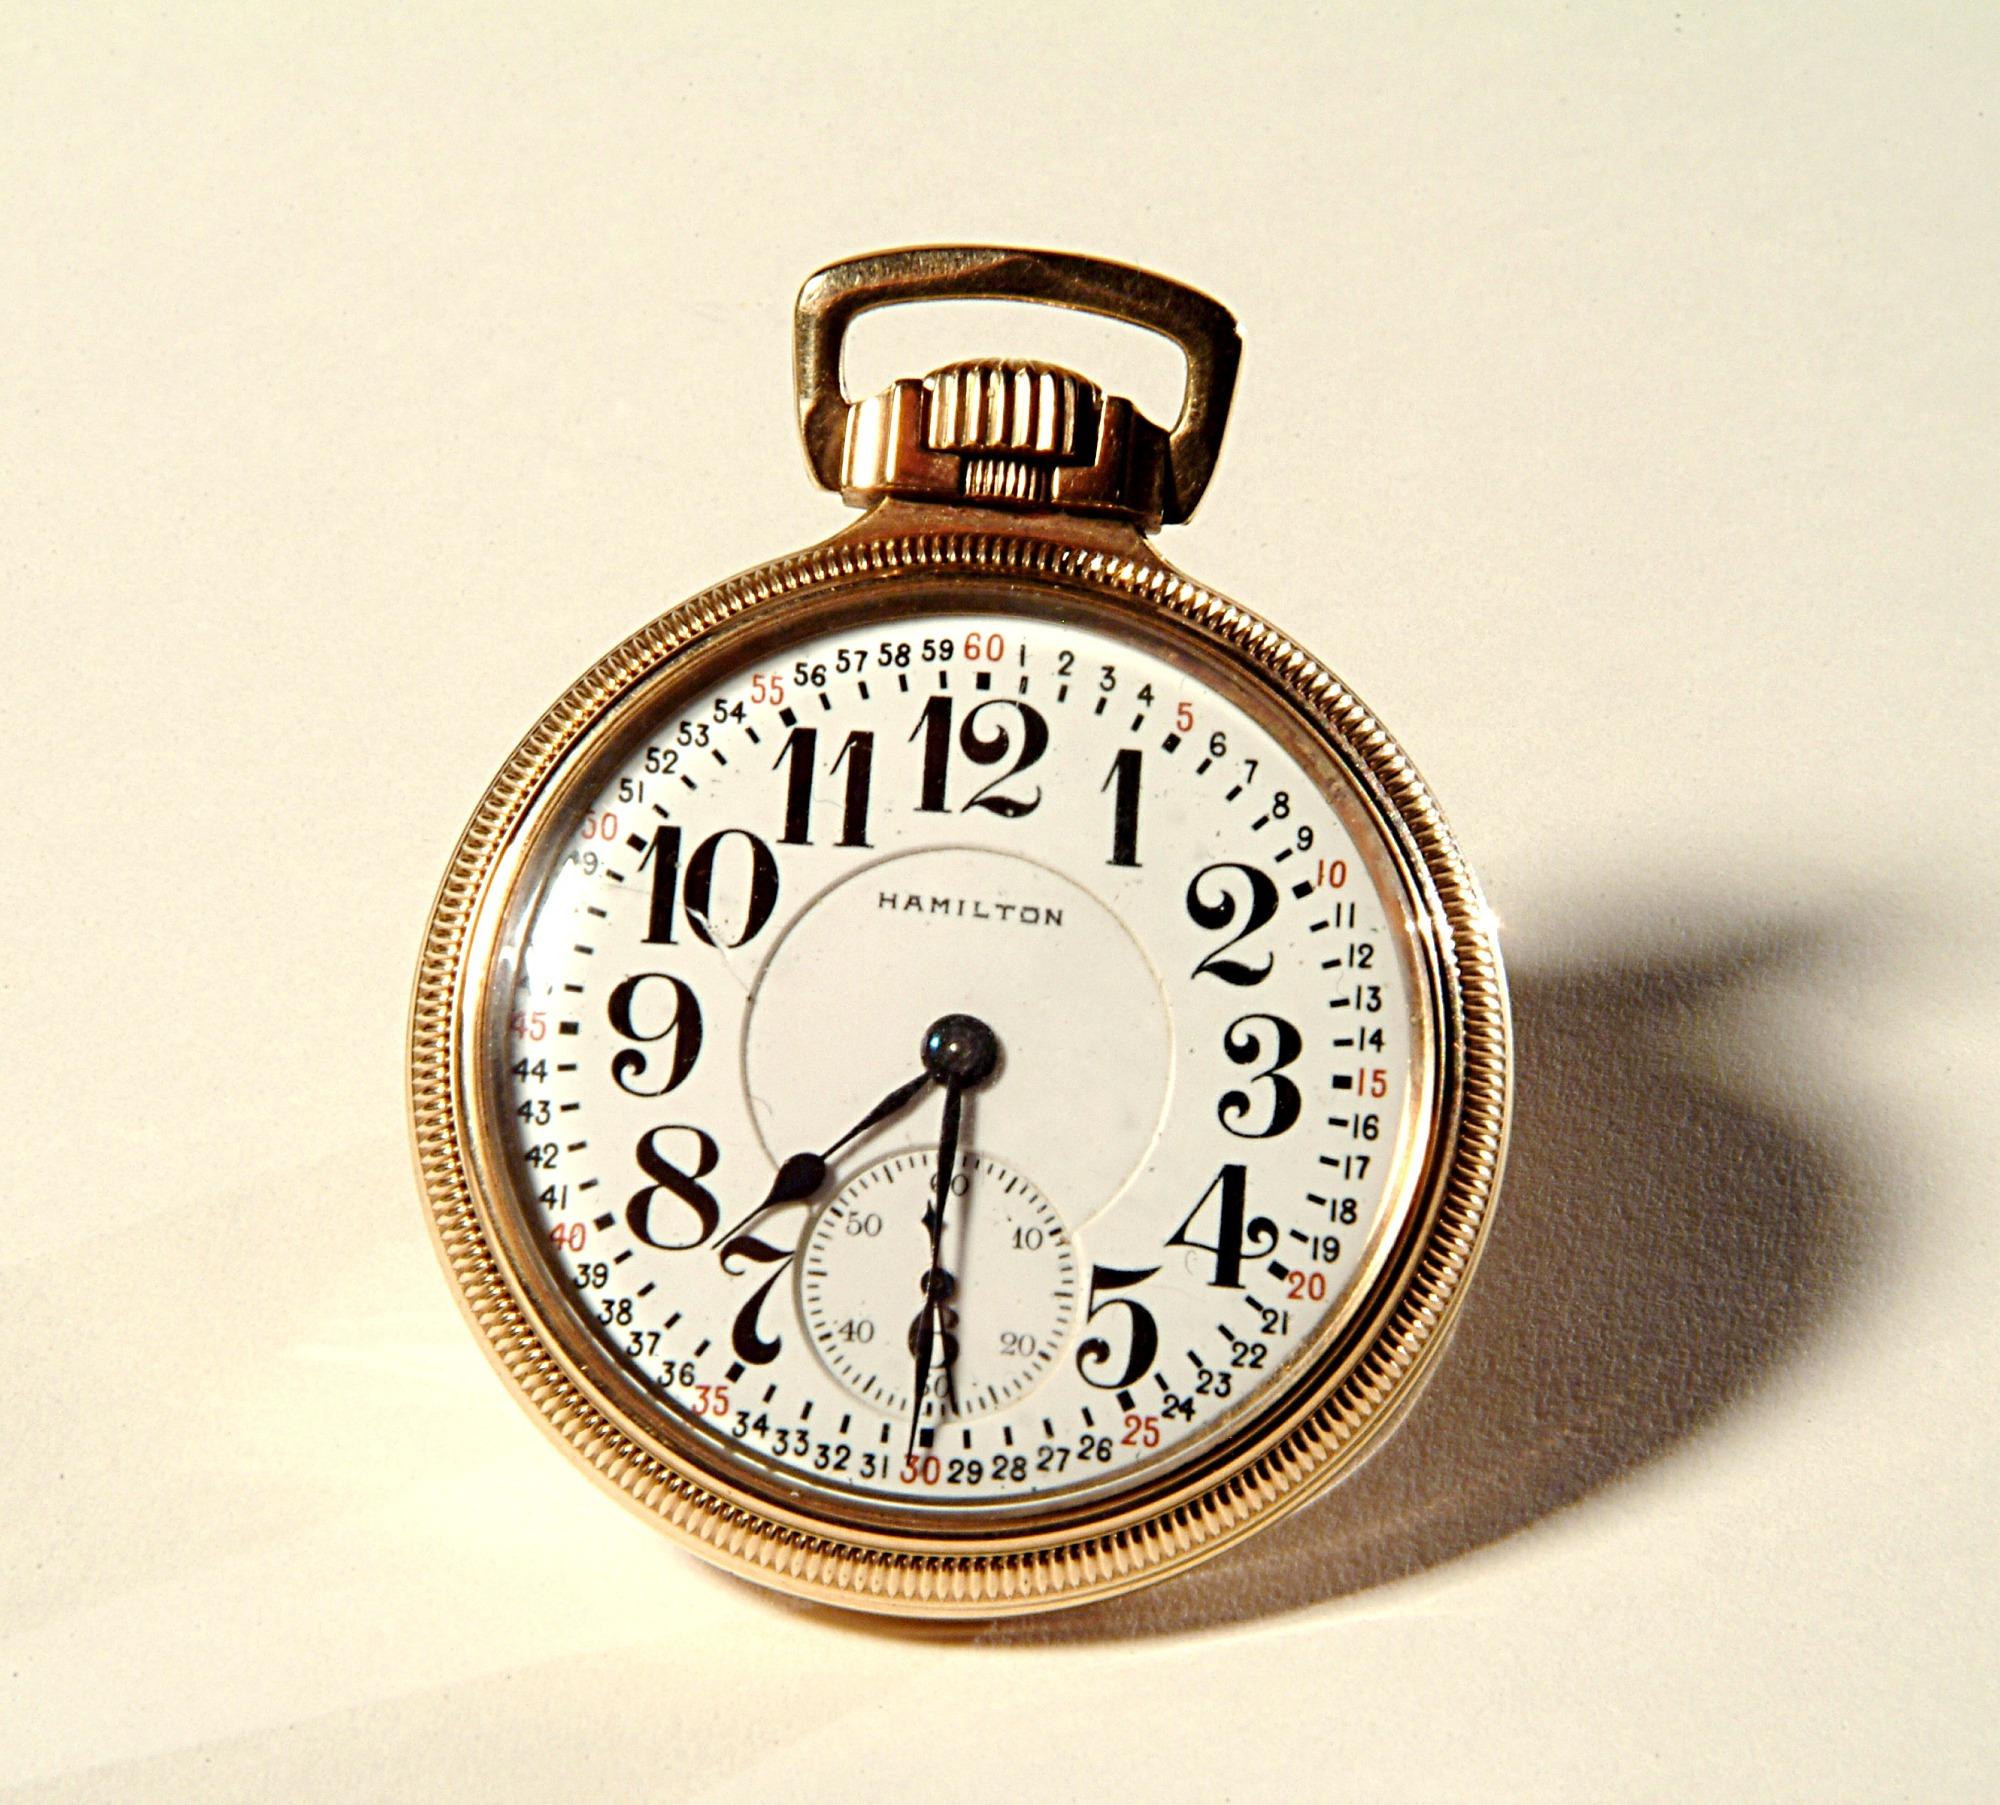 images for Hamilton Model 950 Pocket Watch